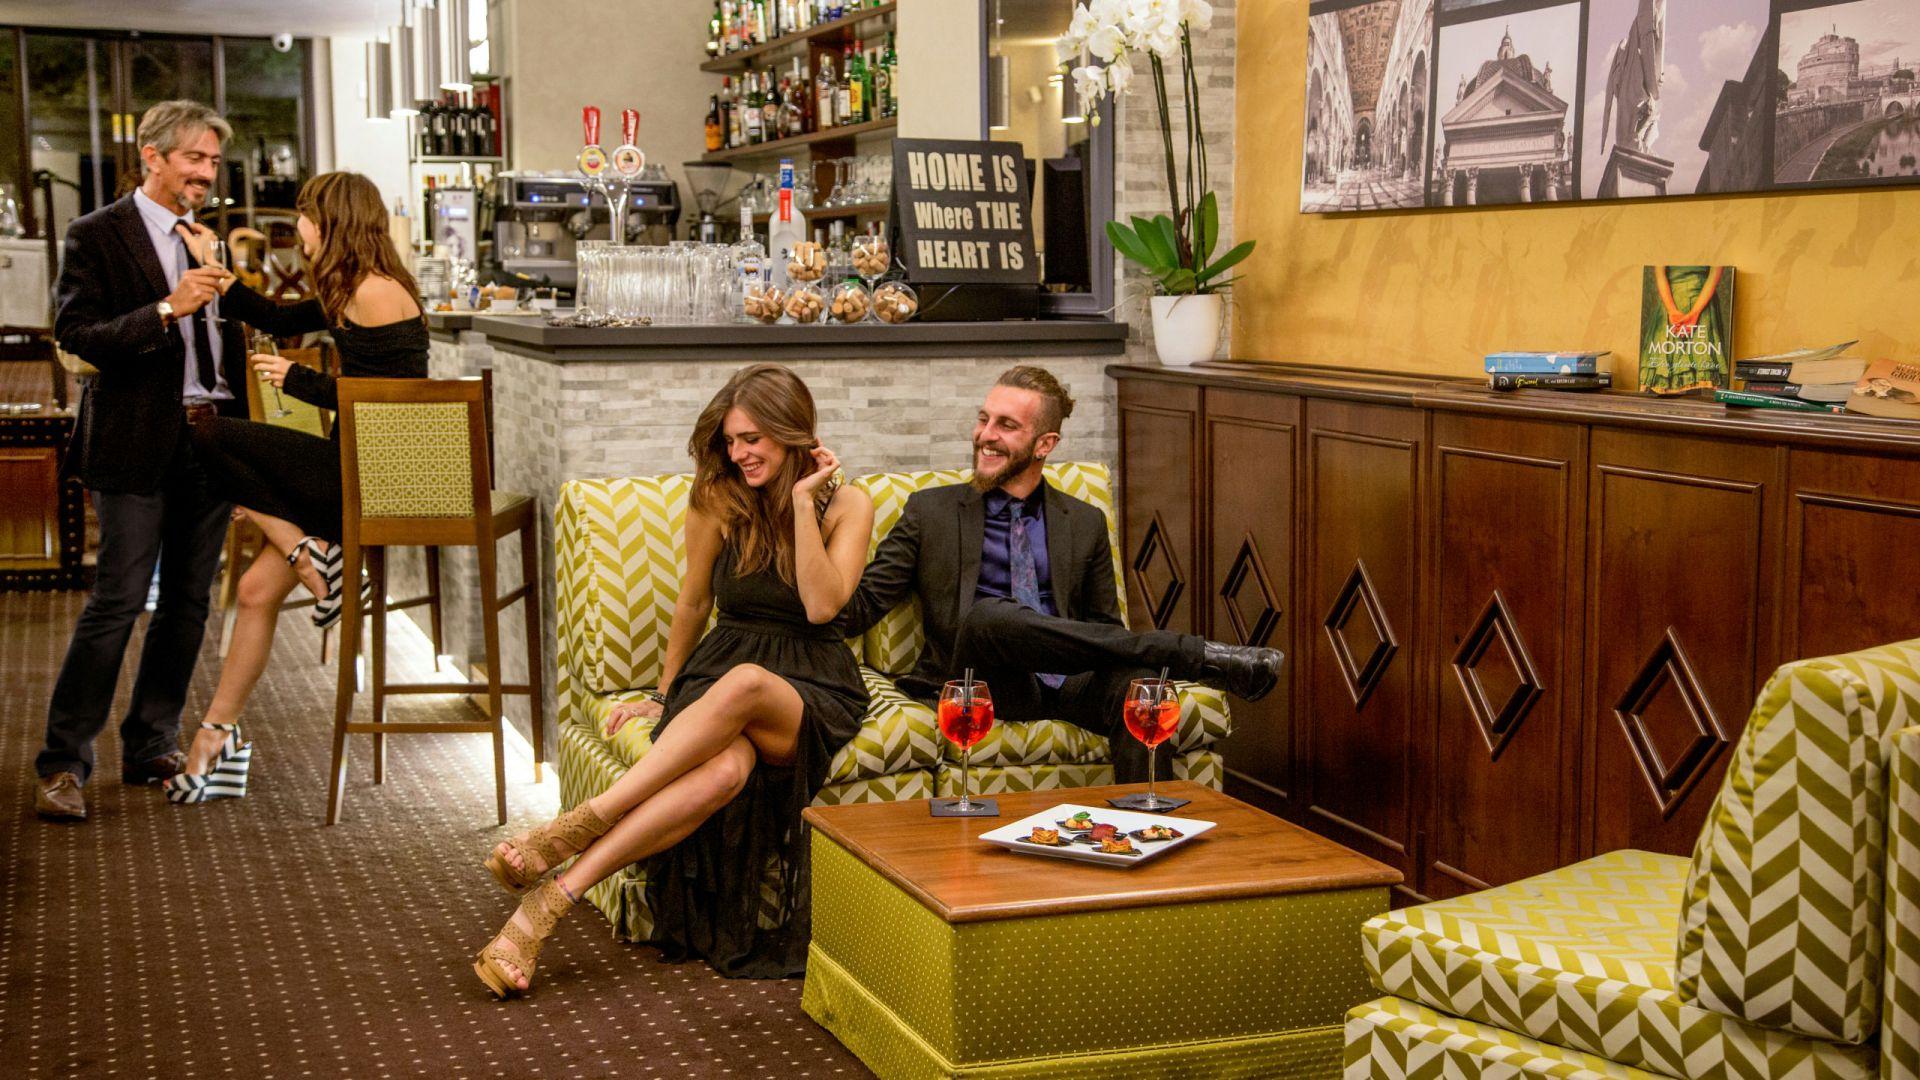 Foto-Hotel-Oxford-Roma-hóspedes-9